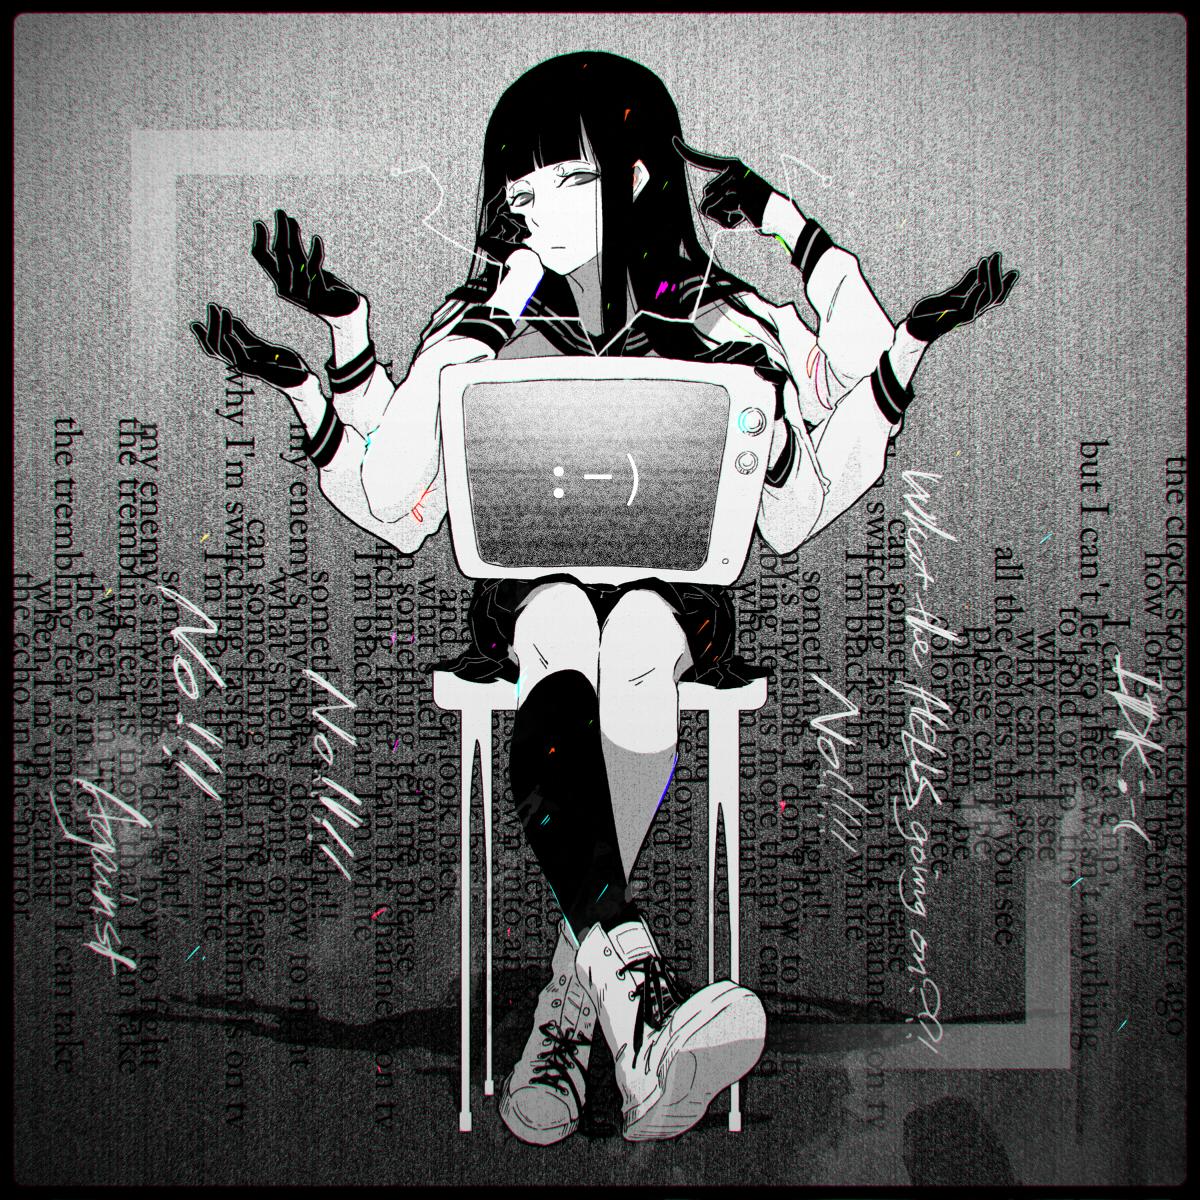 TV | page 3 of 62 - Zerochan Anime Image Board